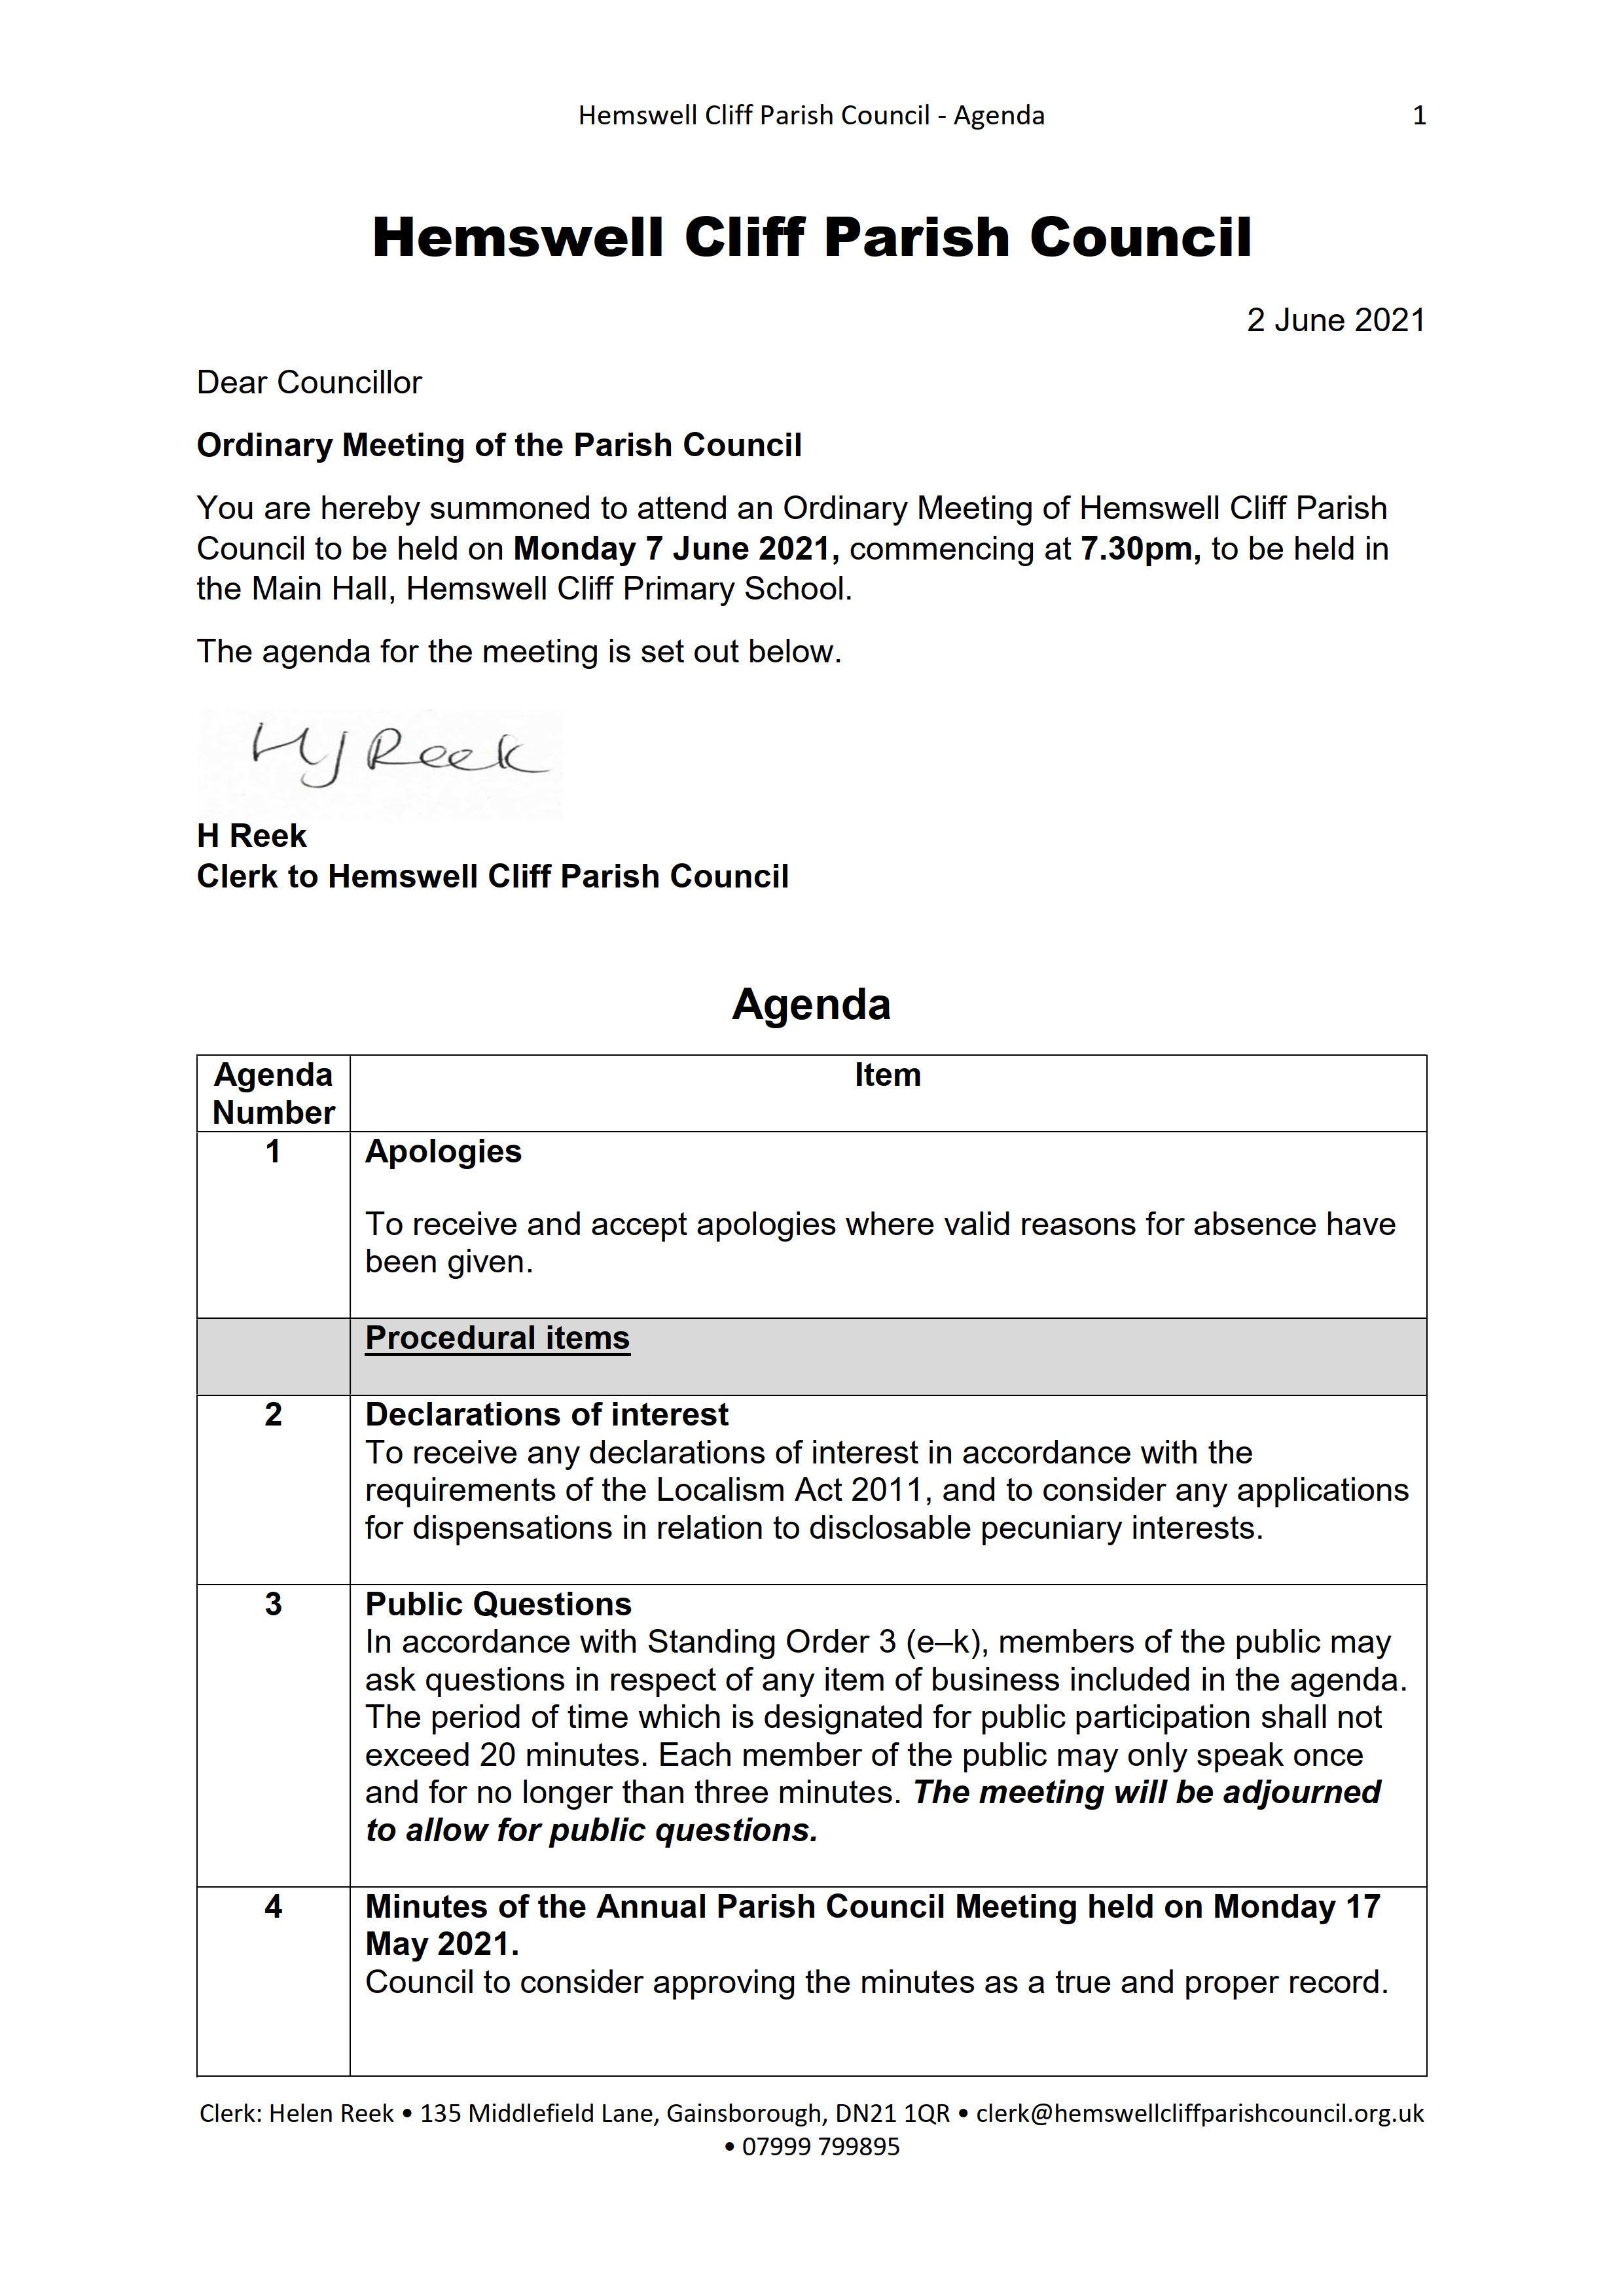 HCPC_Agenda_07.06.21_1.jpg